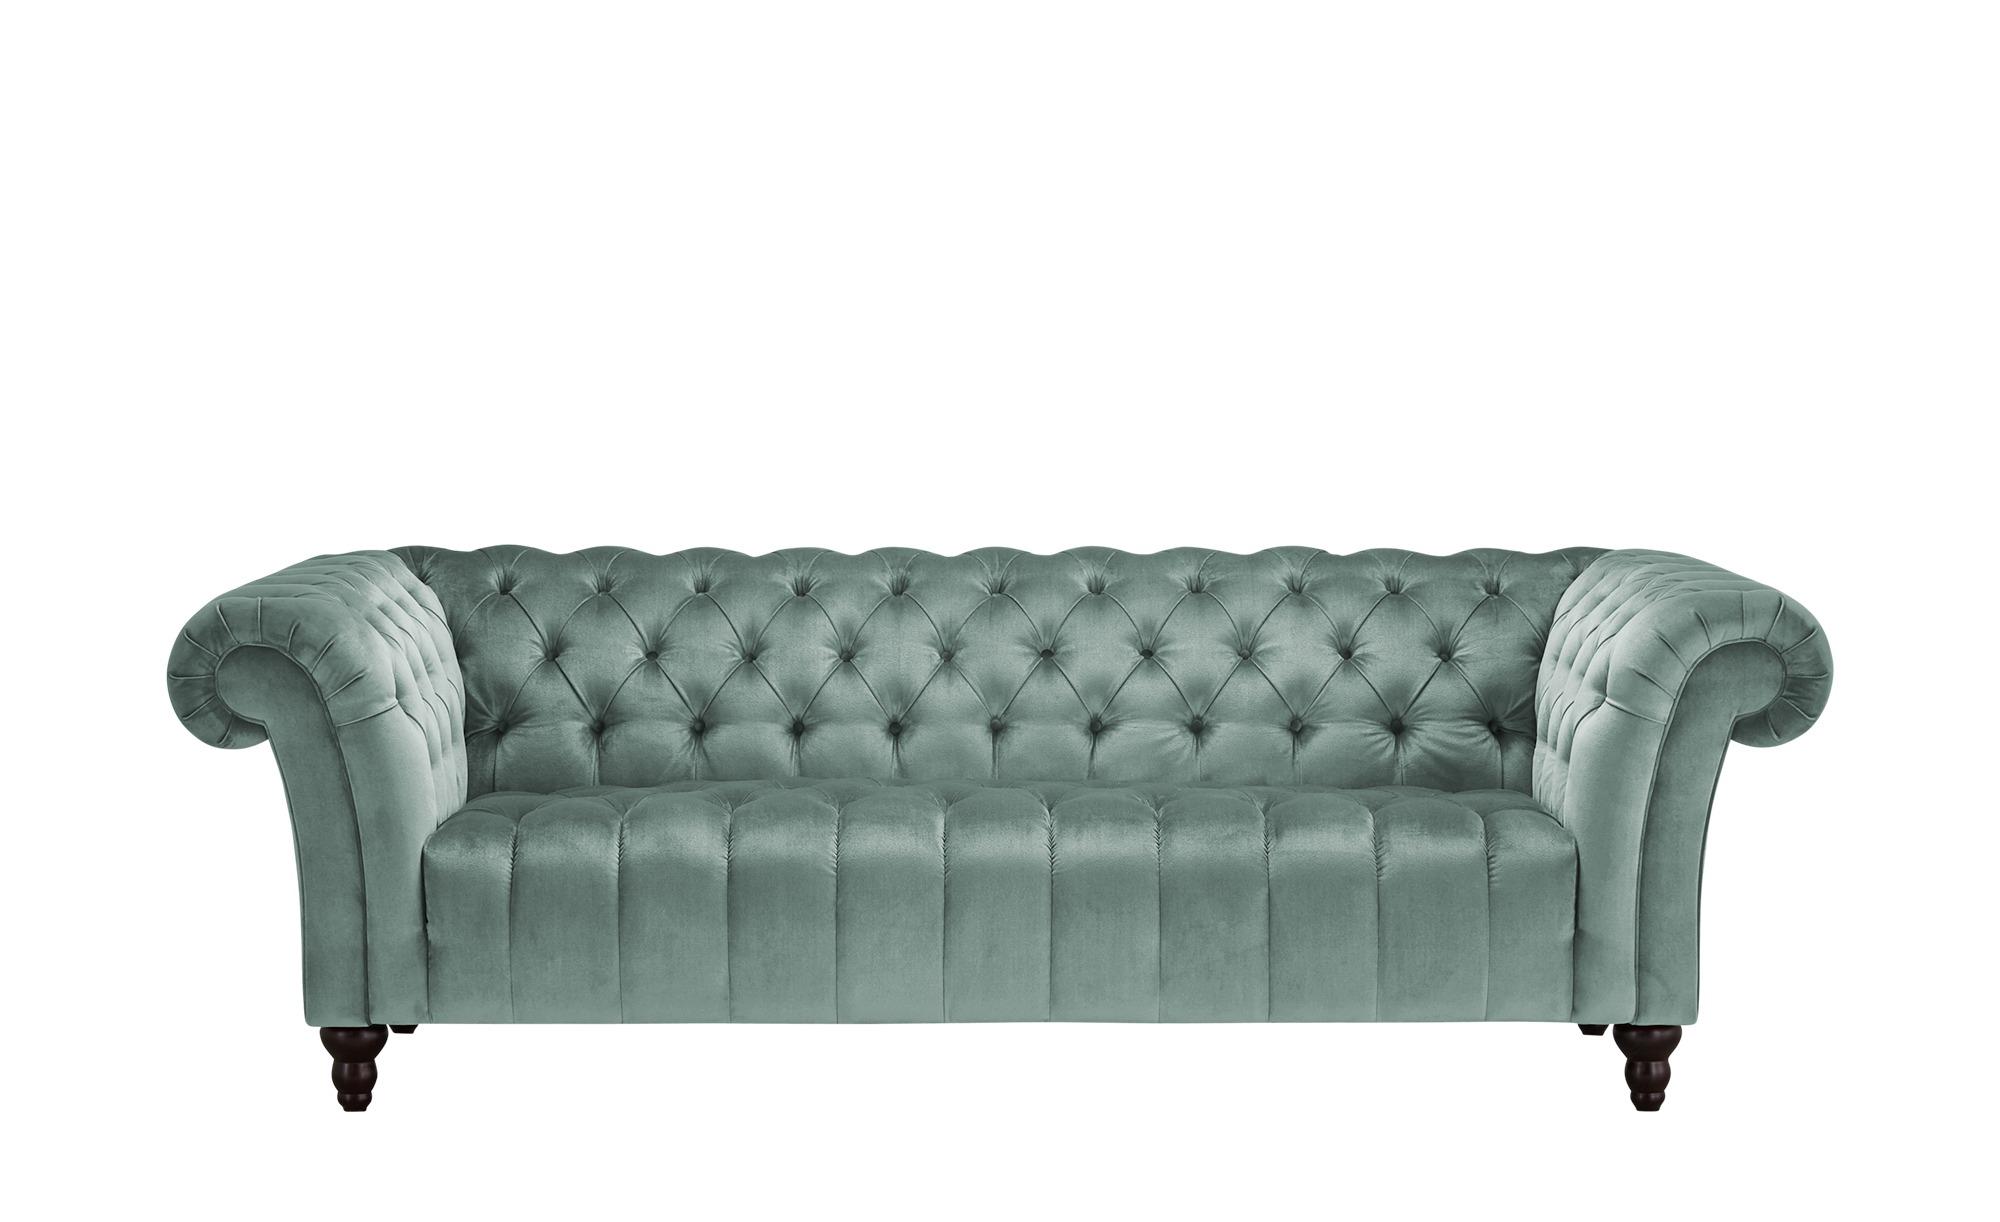 Big Sofa  Canyon ¦ blau ¦ Maße (cm): B: 230 H: 74 T: 101 Polstermöbel > Sofas > Big-Sofas - Höffner